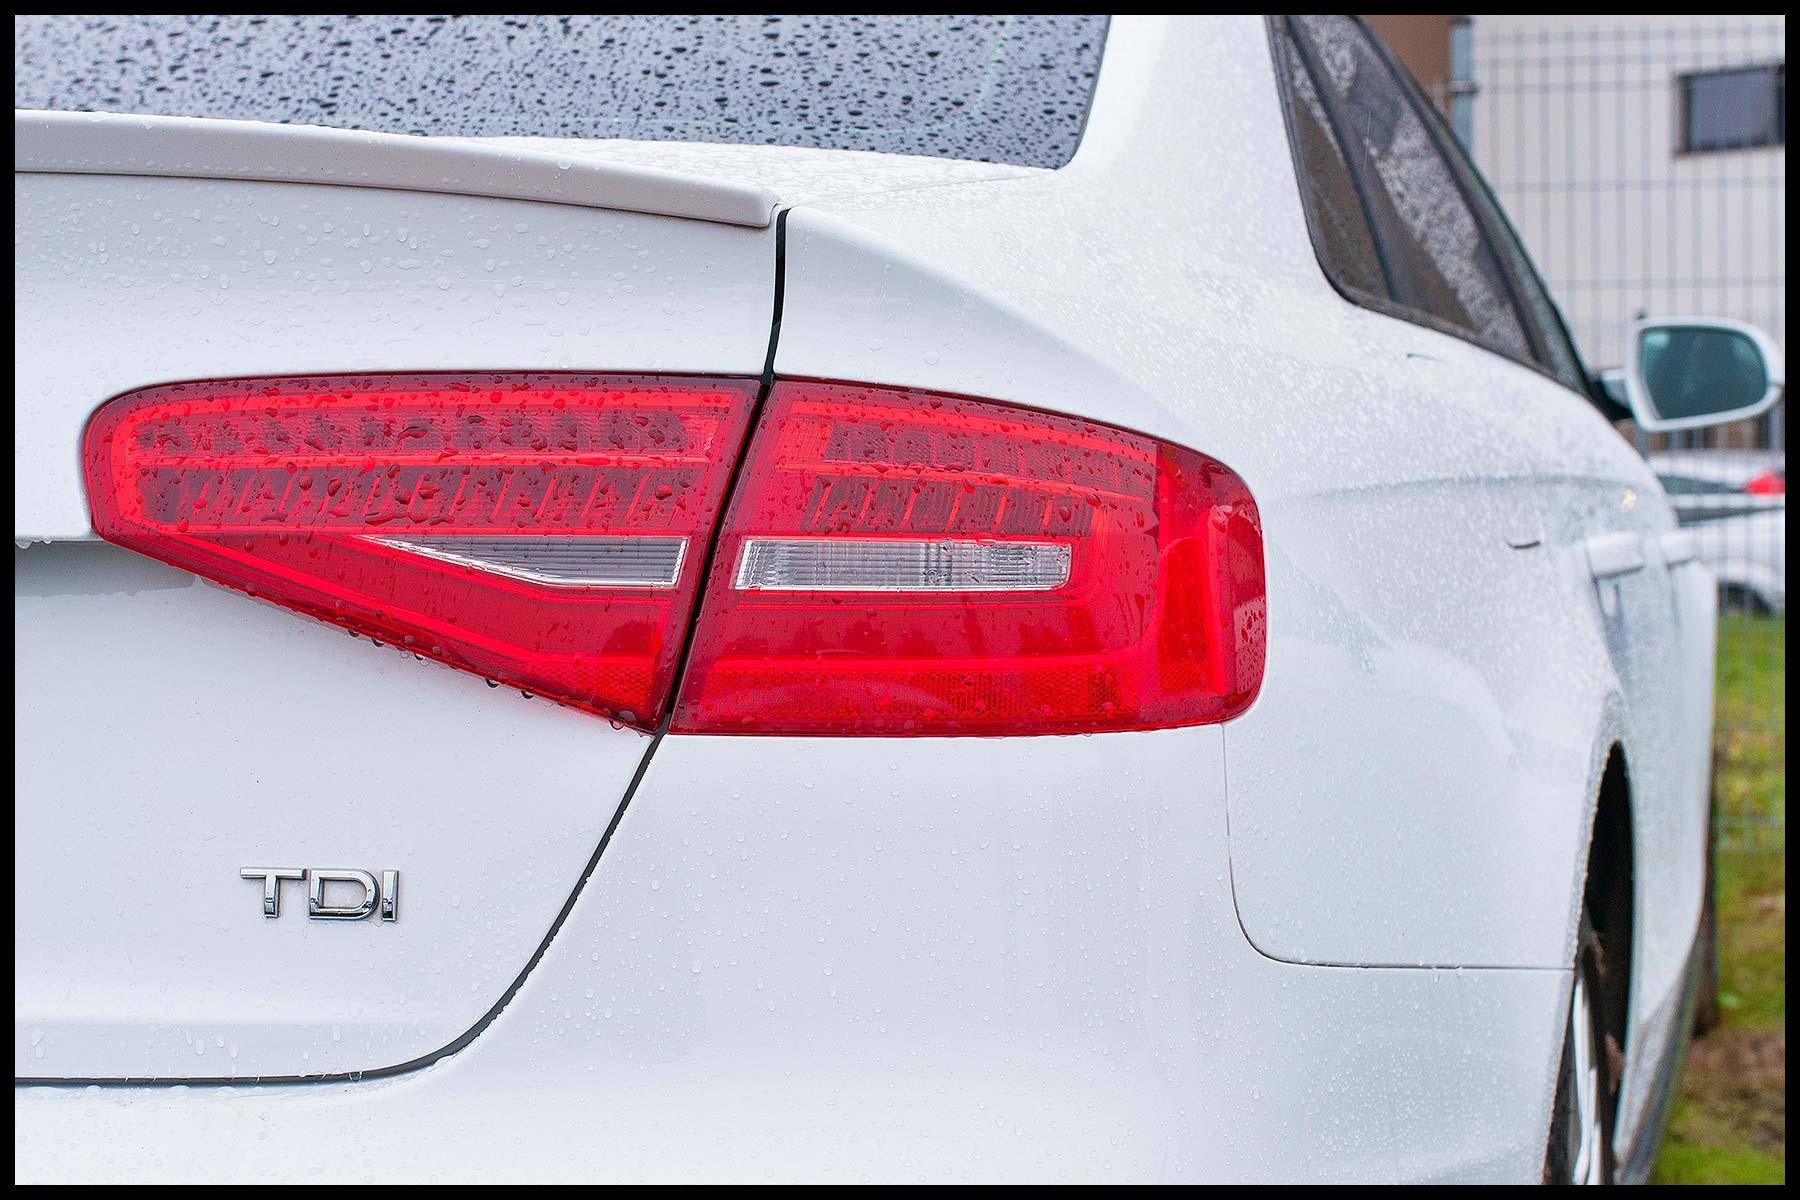 Audi sel with a TDI badge